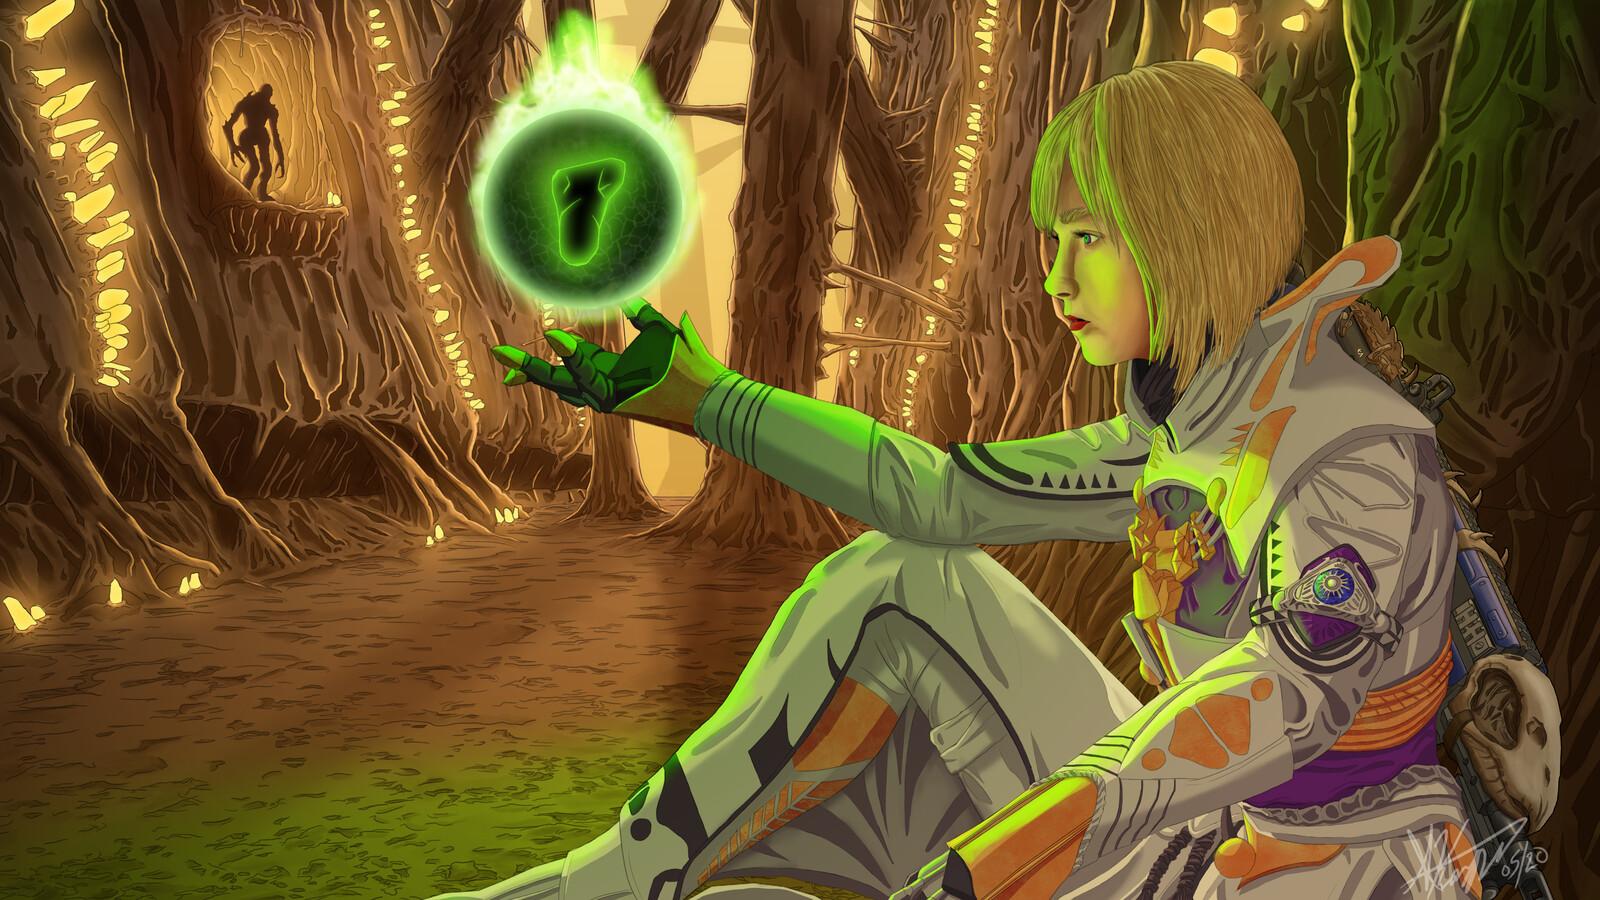 Zivalelyna, The Warlock